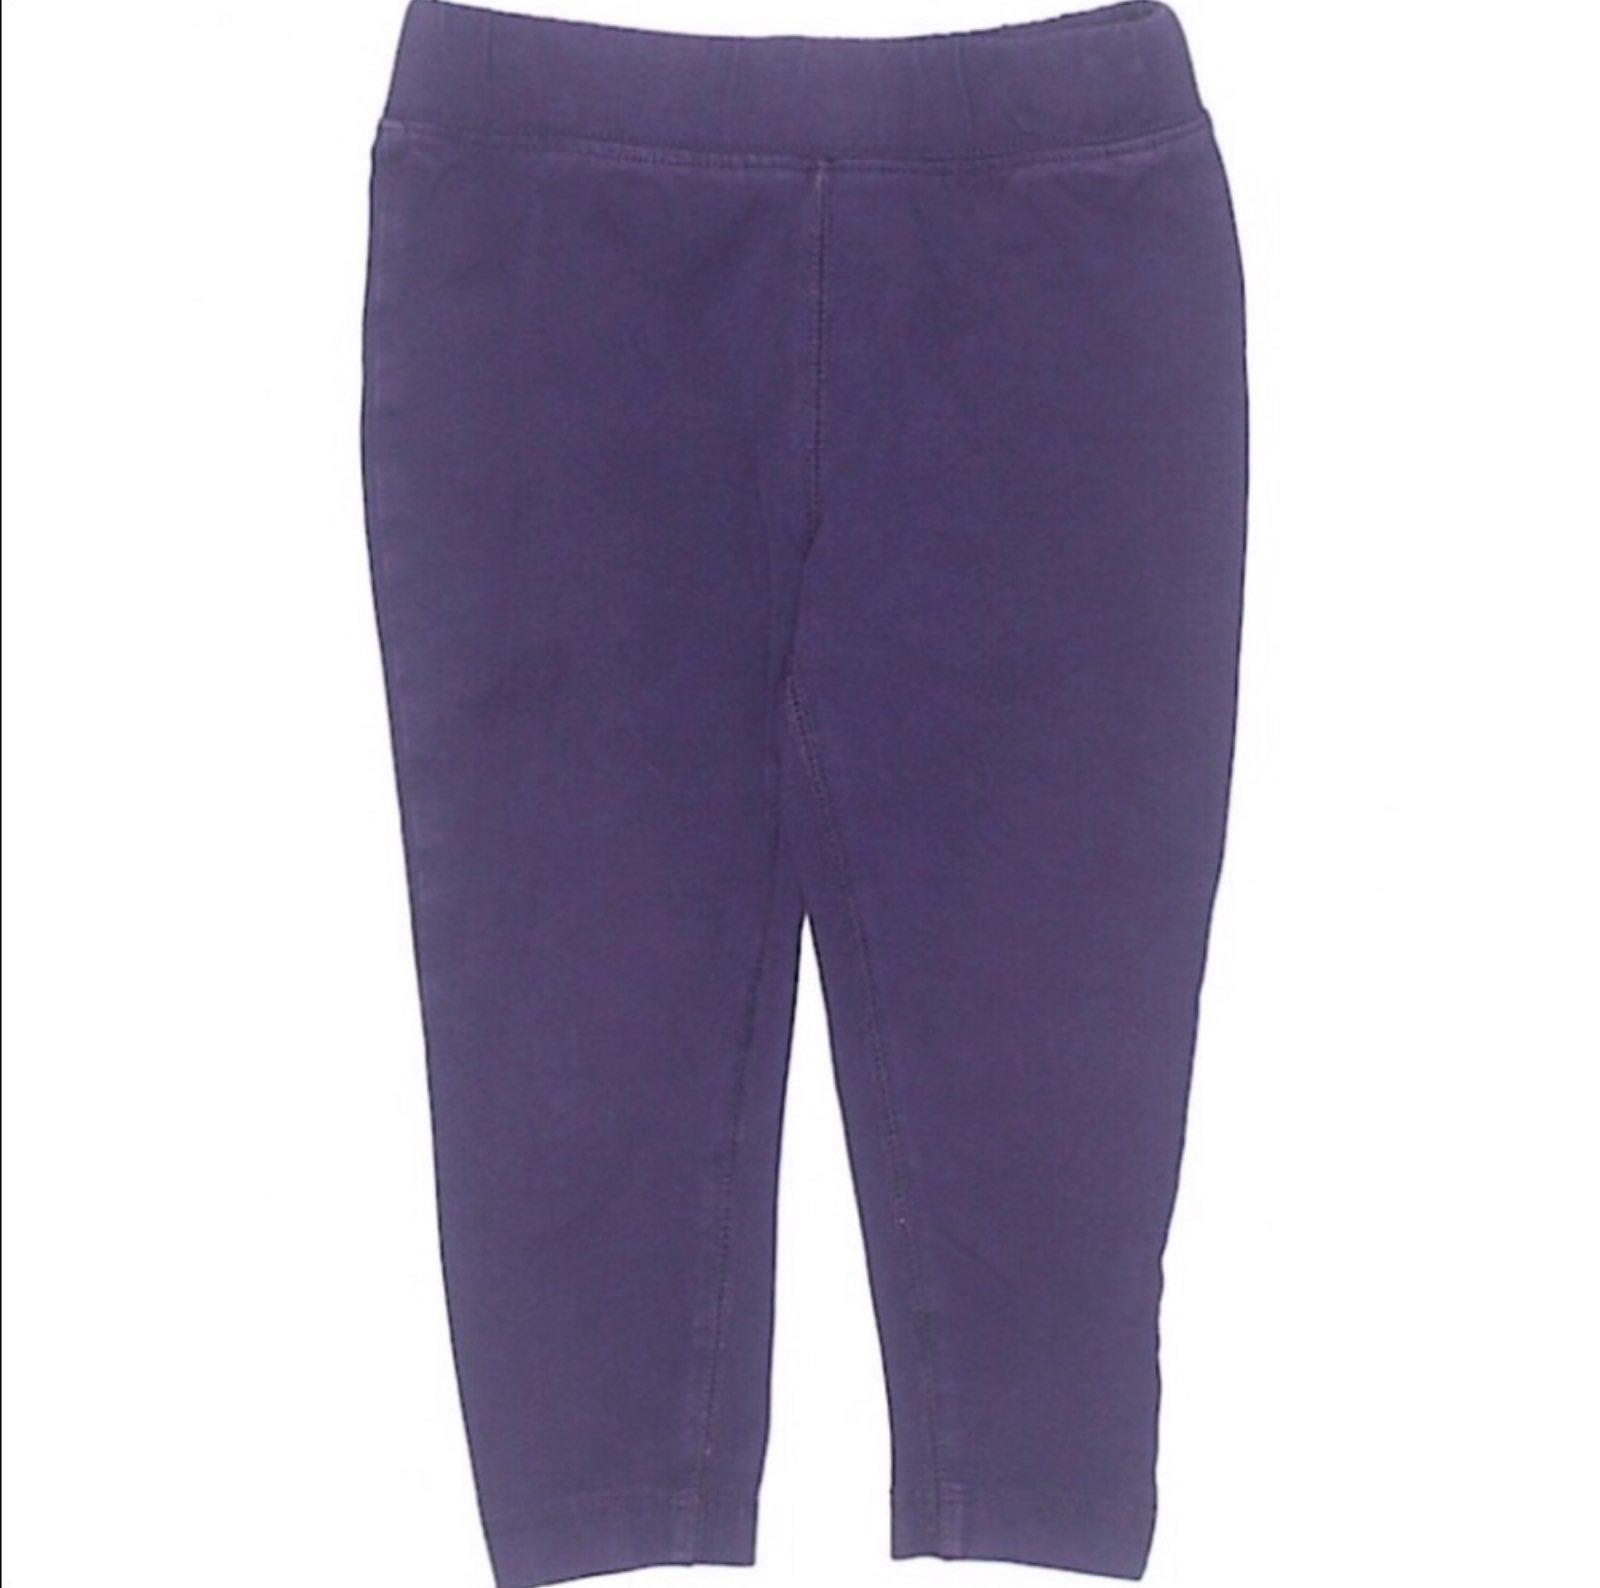 Primary Purple Leggings Girls Size 2T